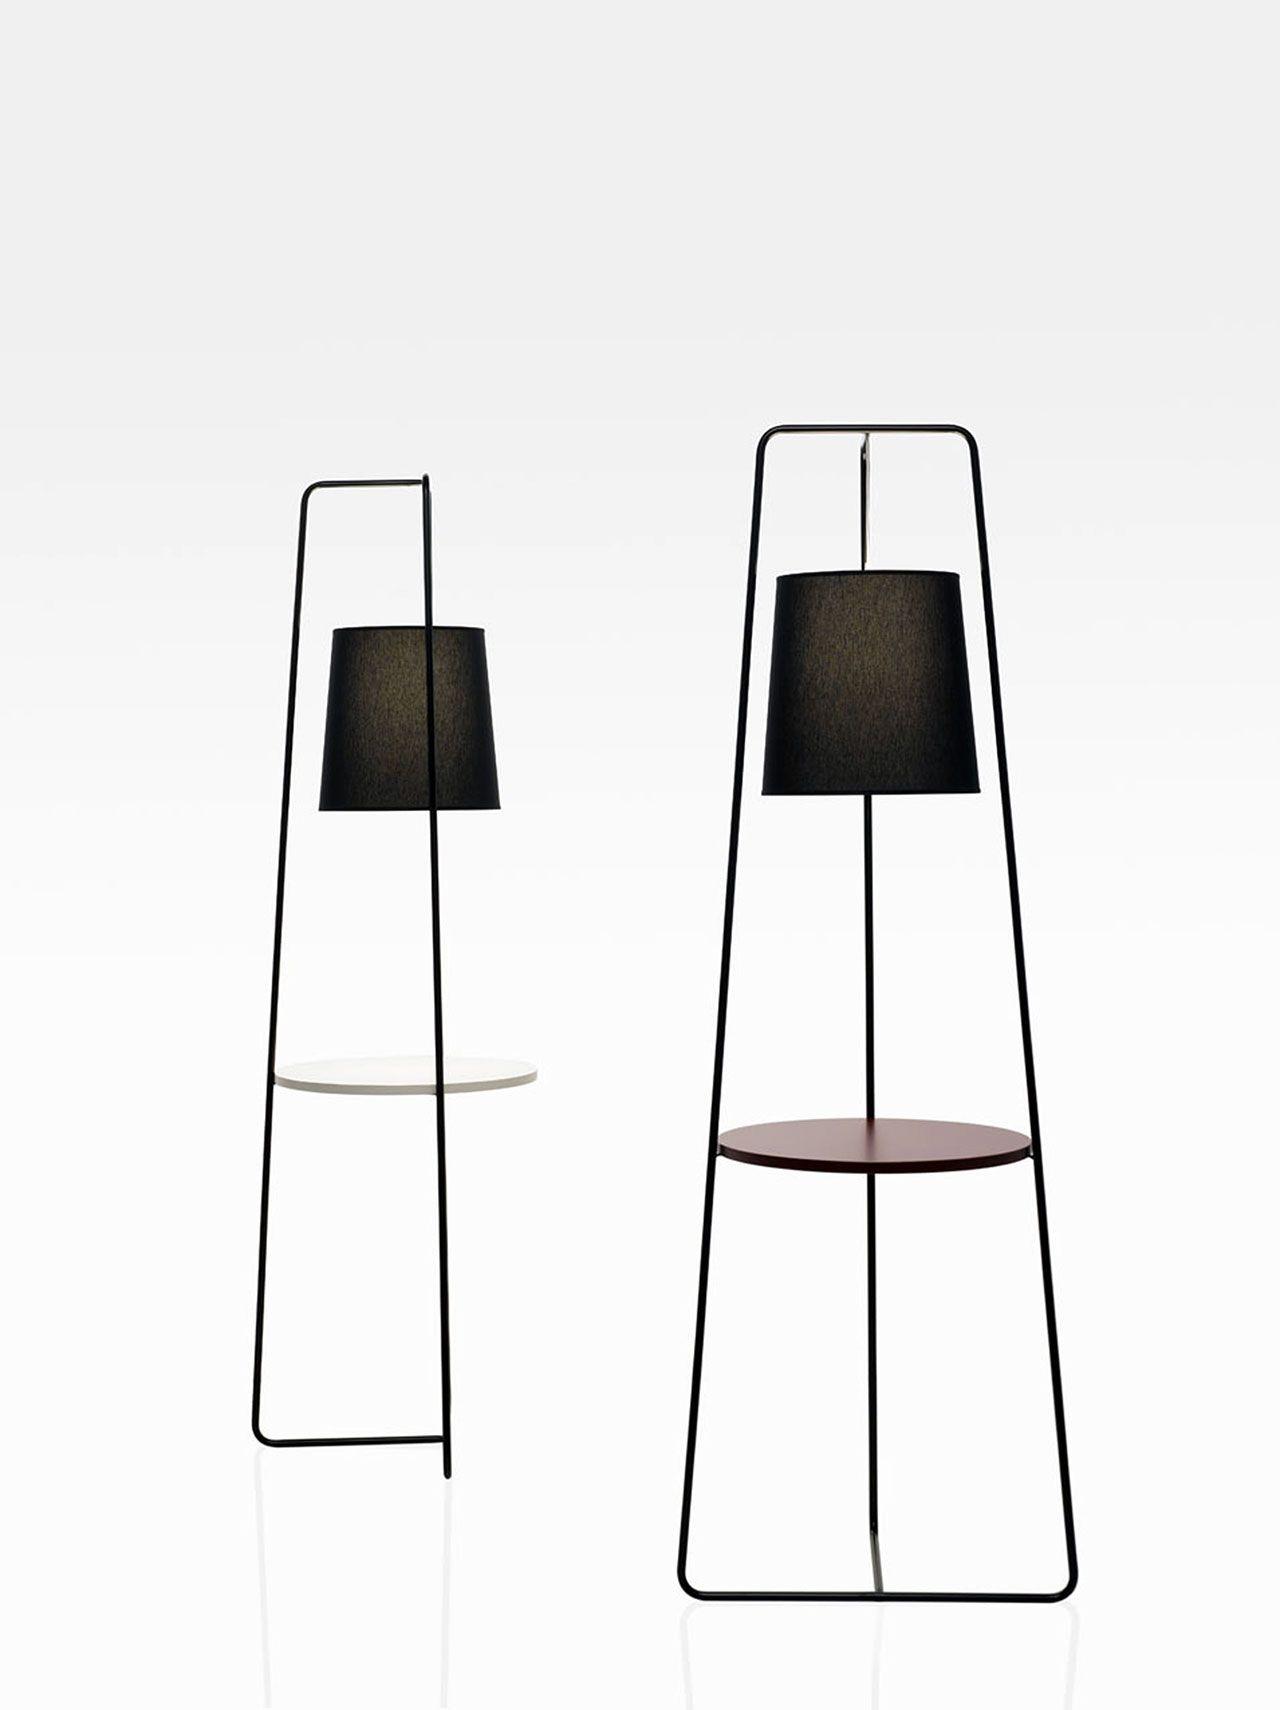 Outline Lamp Helen Kontouris Design